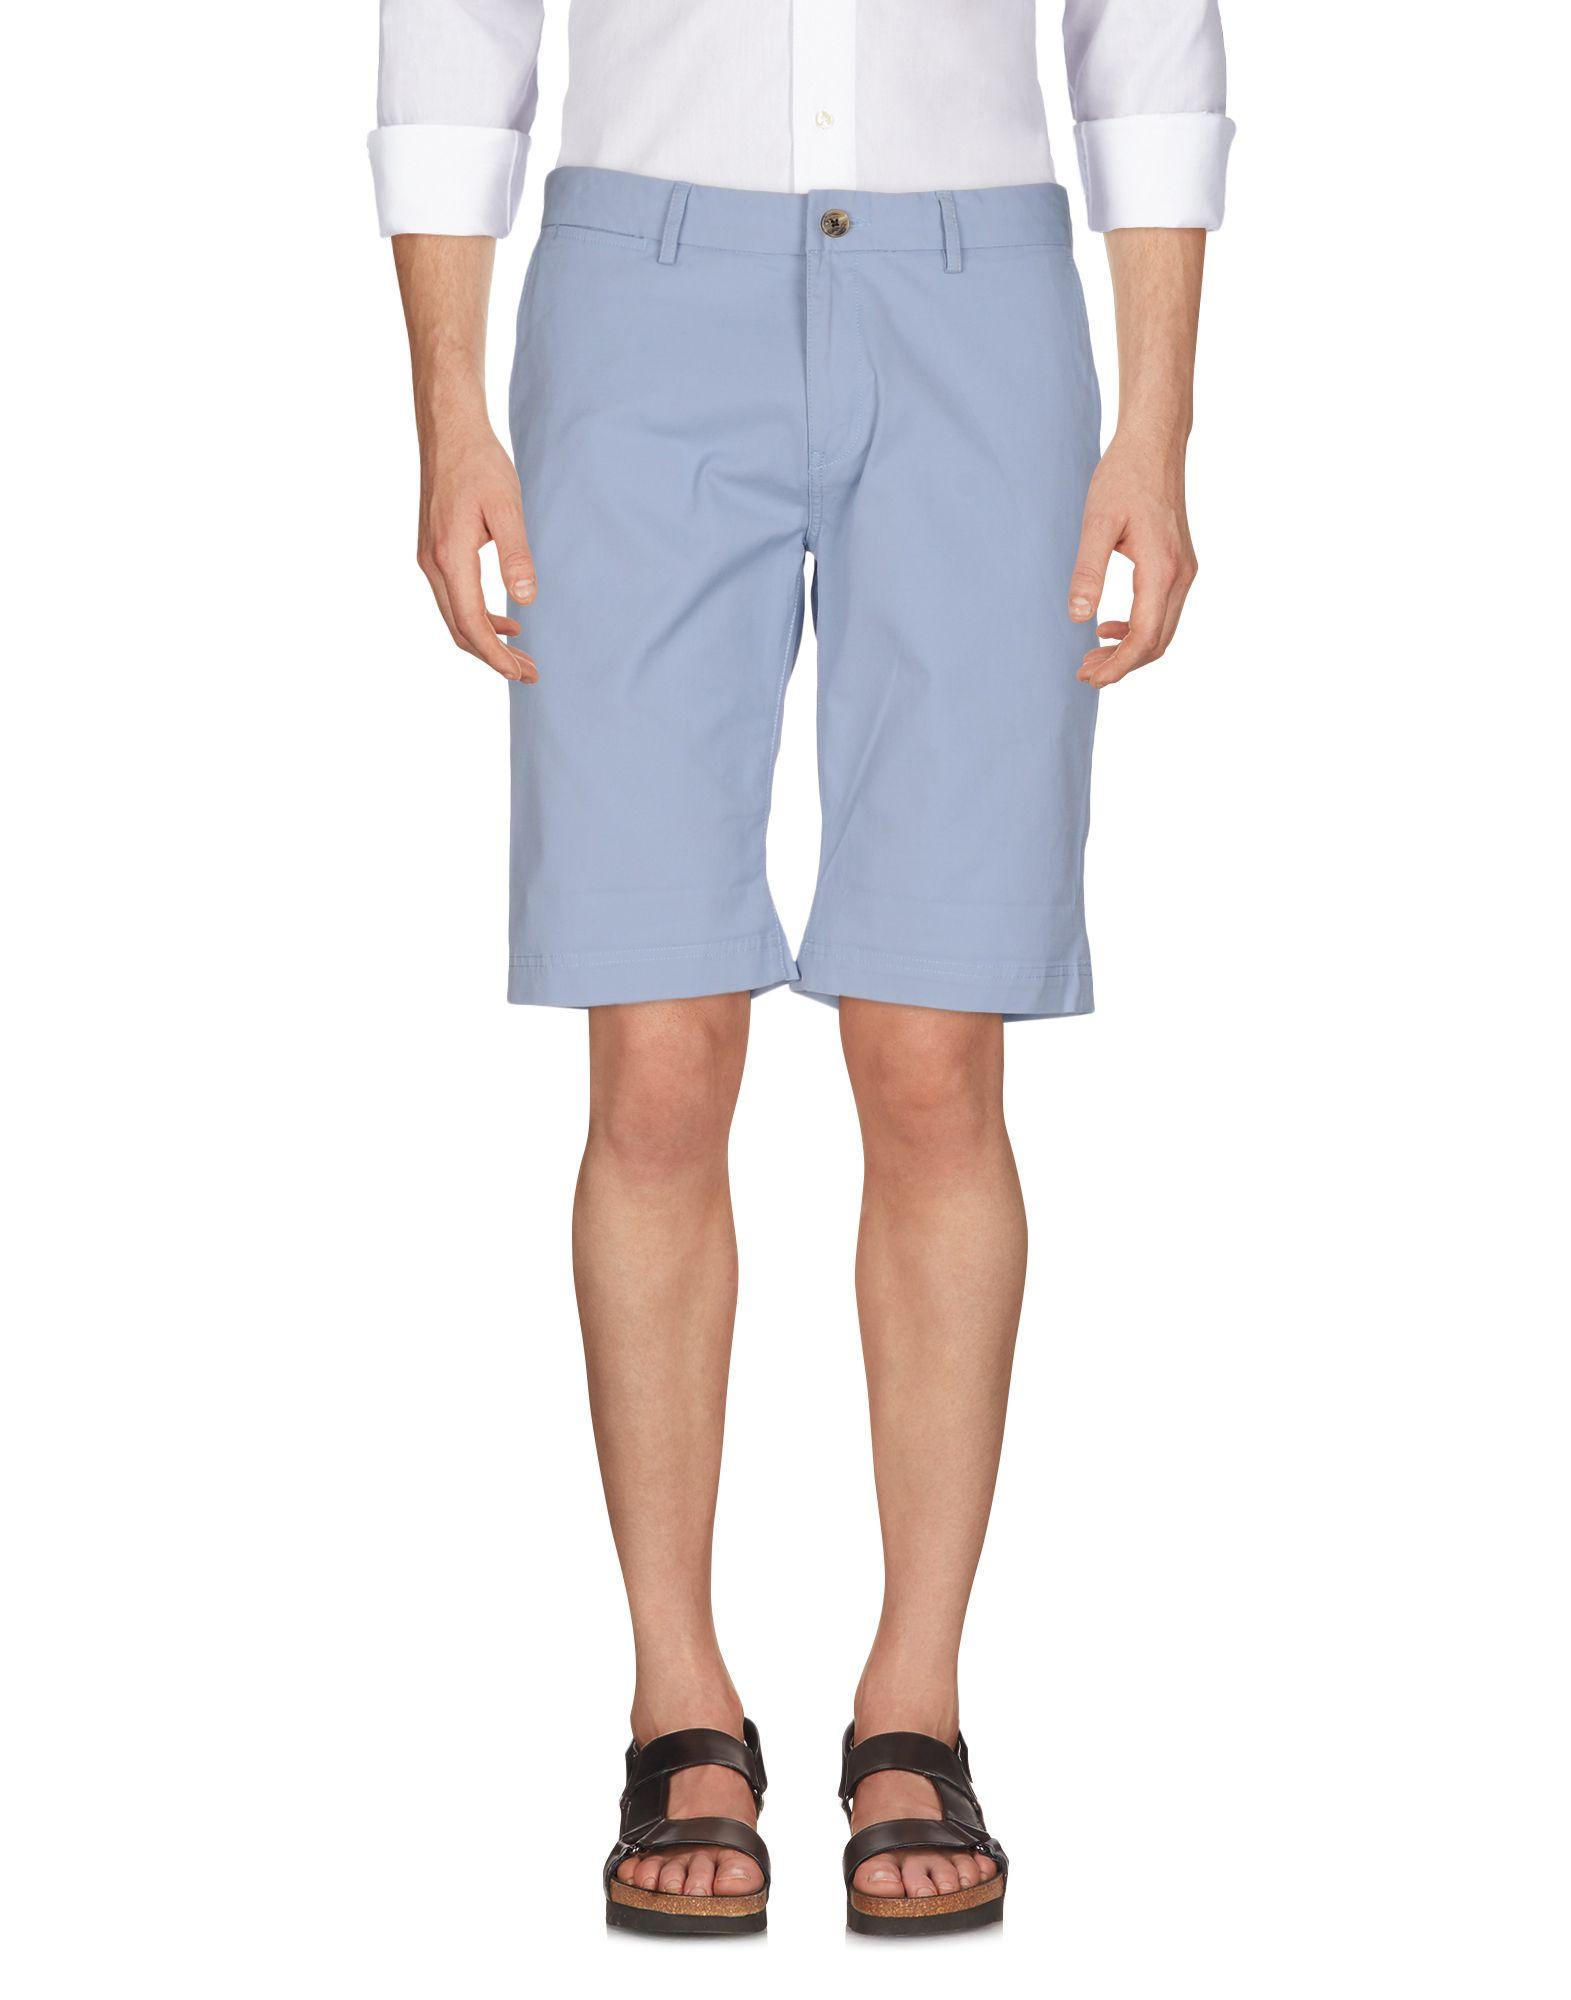 Shorts Shorts Shorts & Bermuda Ben Sherman Uomo - 13133459BO b4d8ae